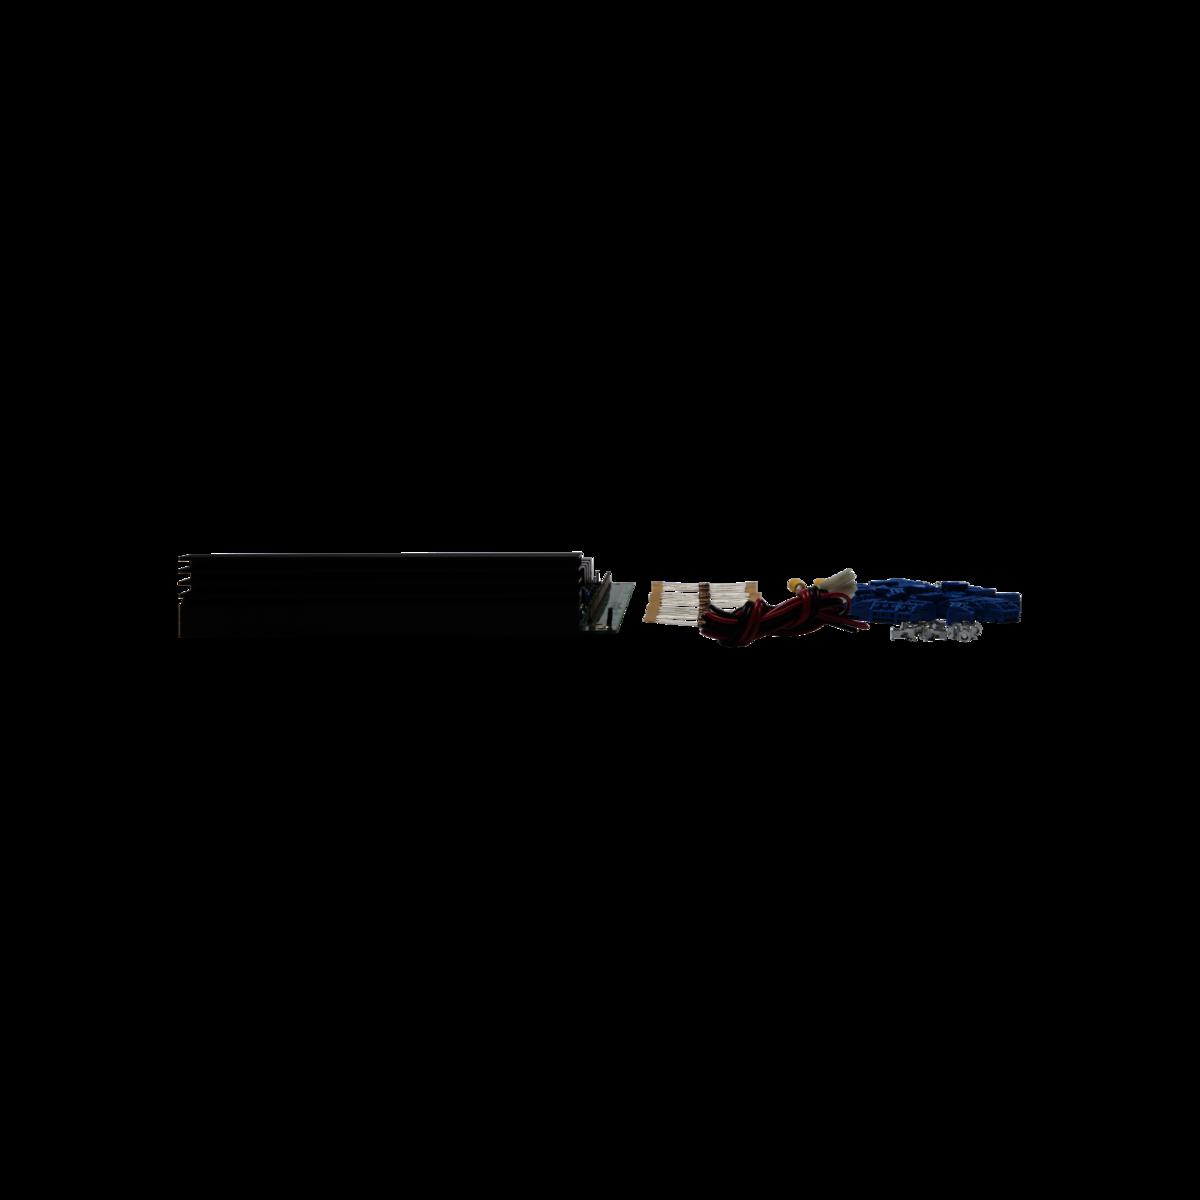 S5180_4